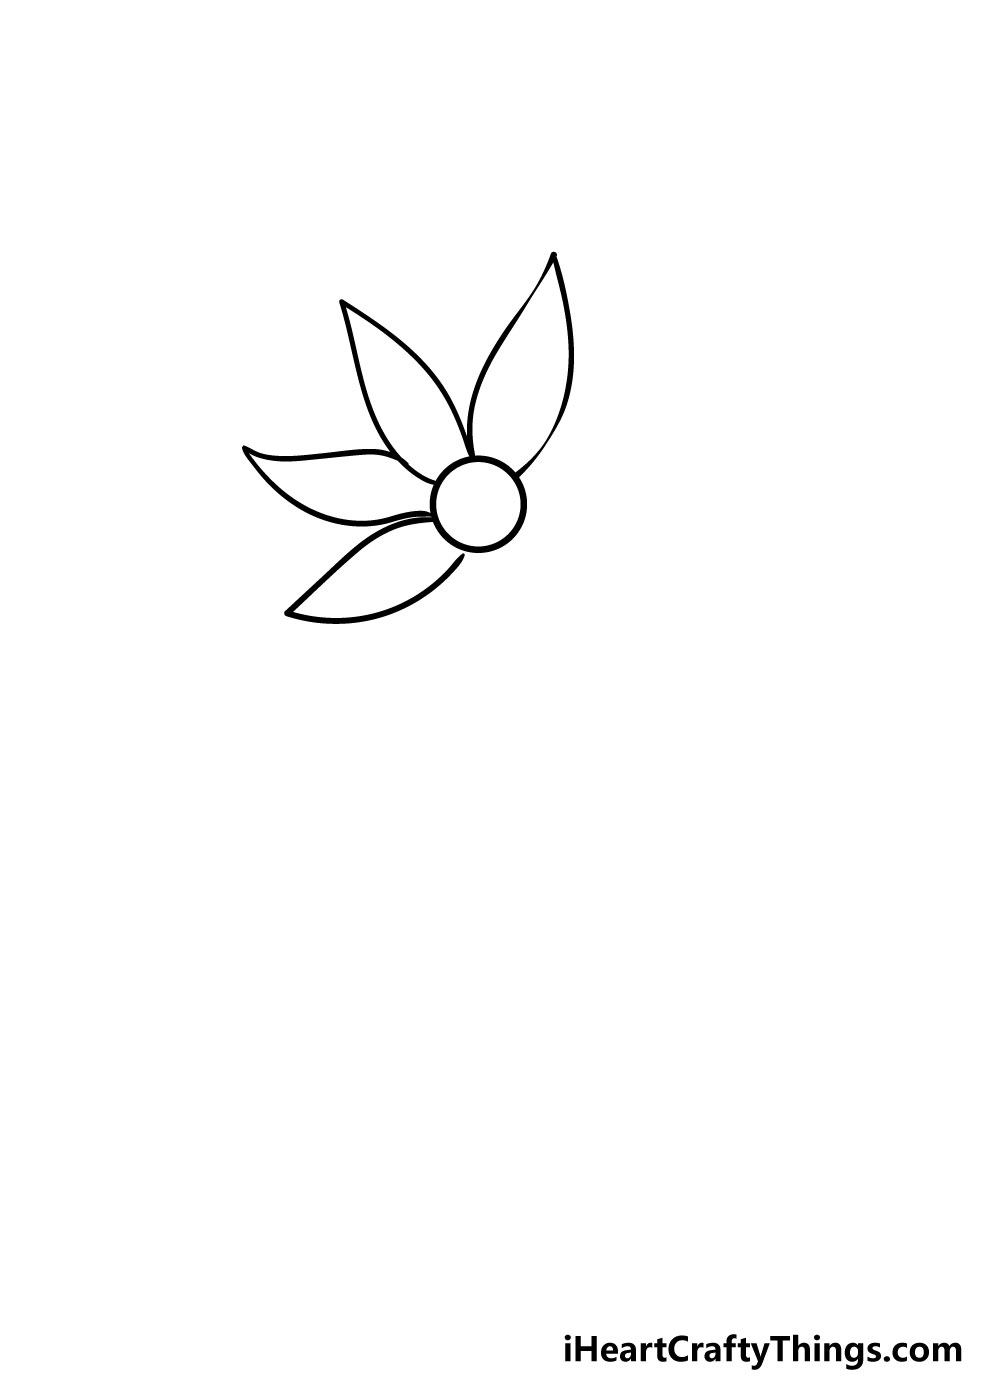 flower drawing step 3